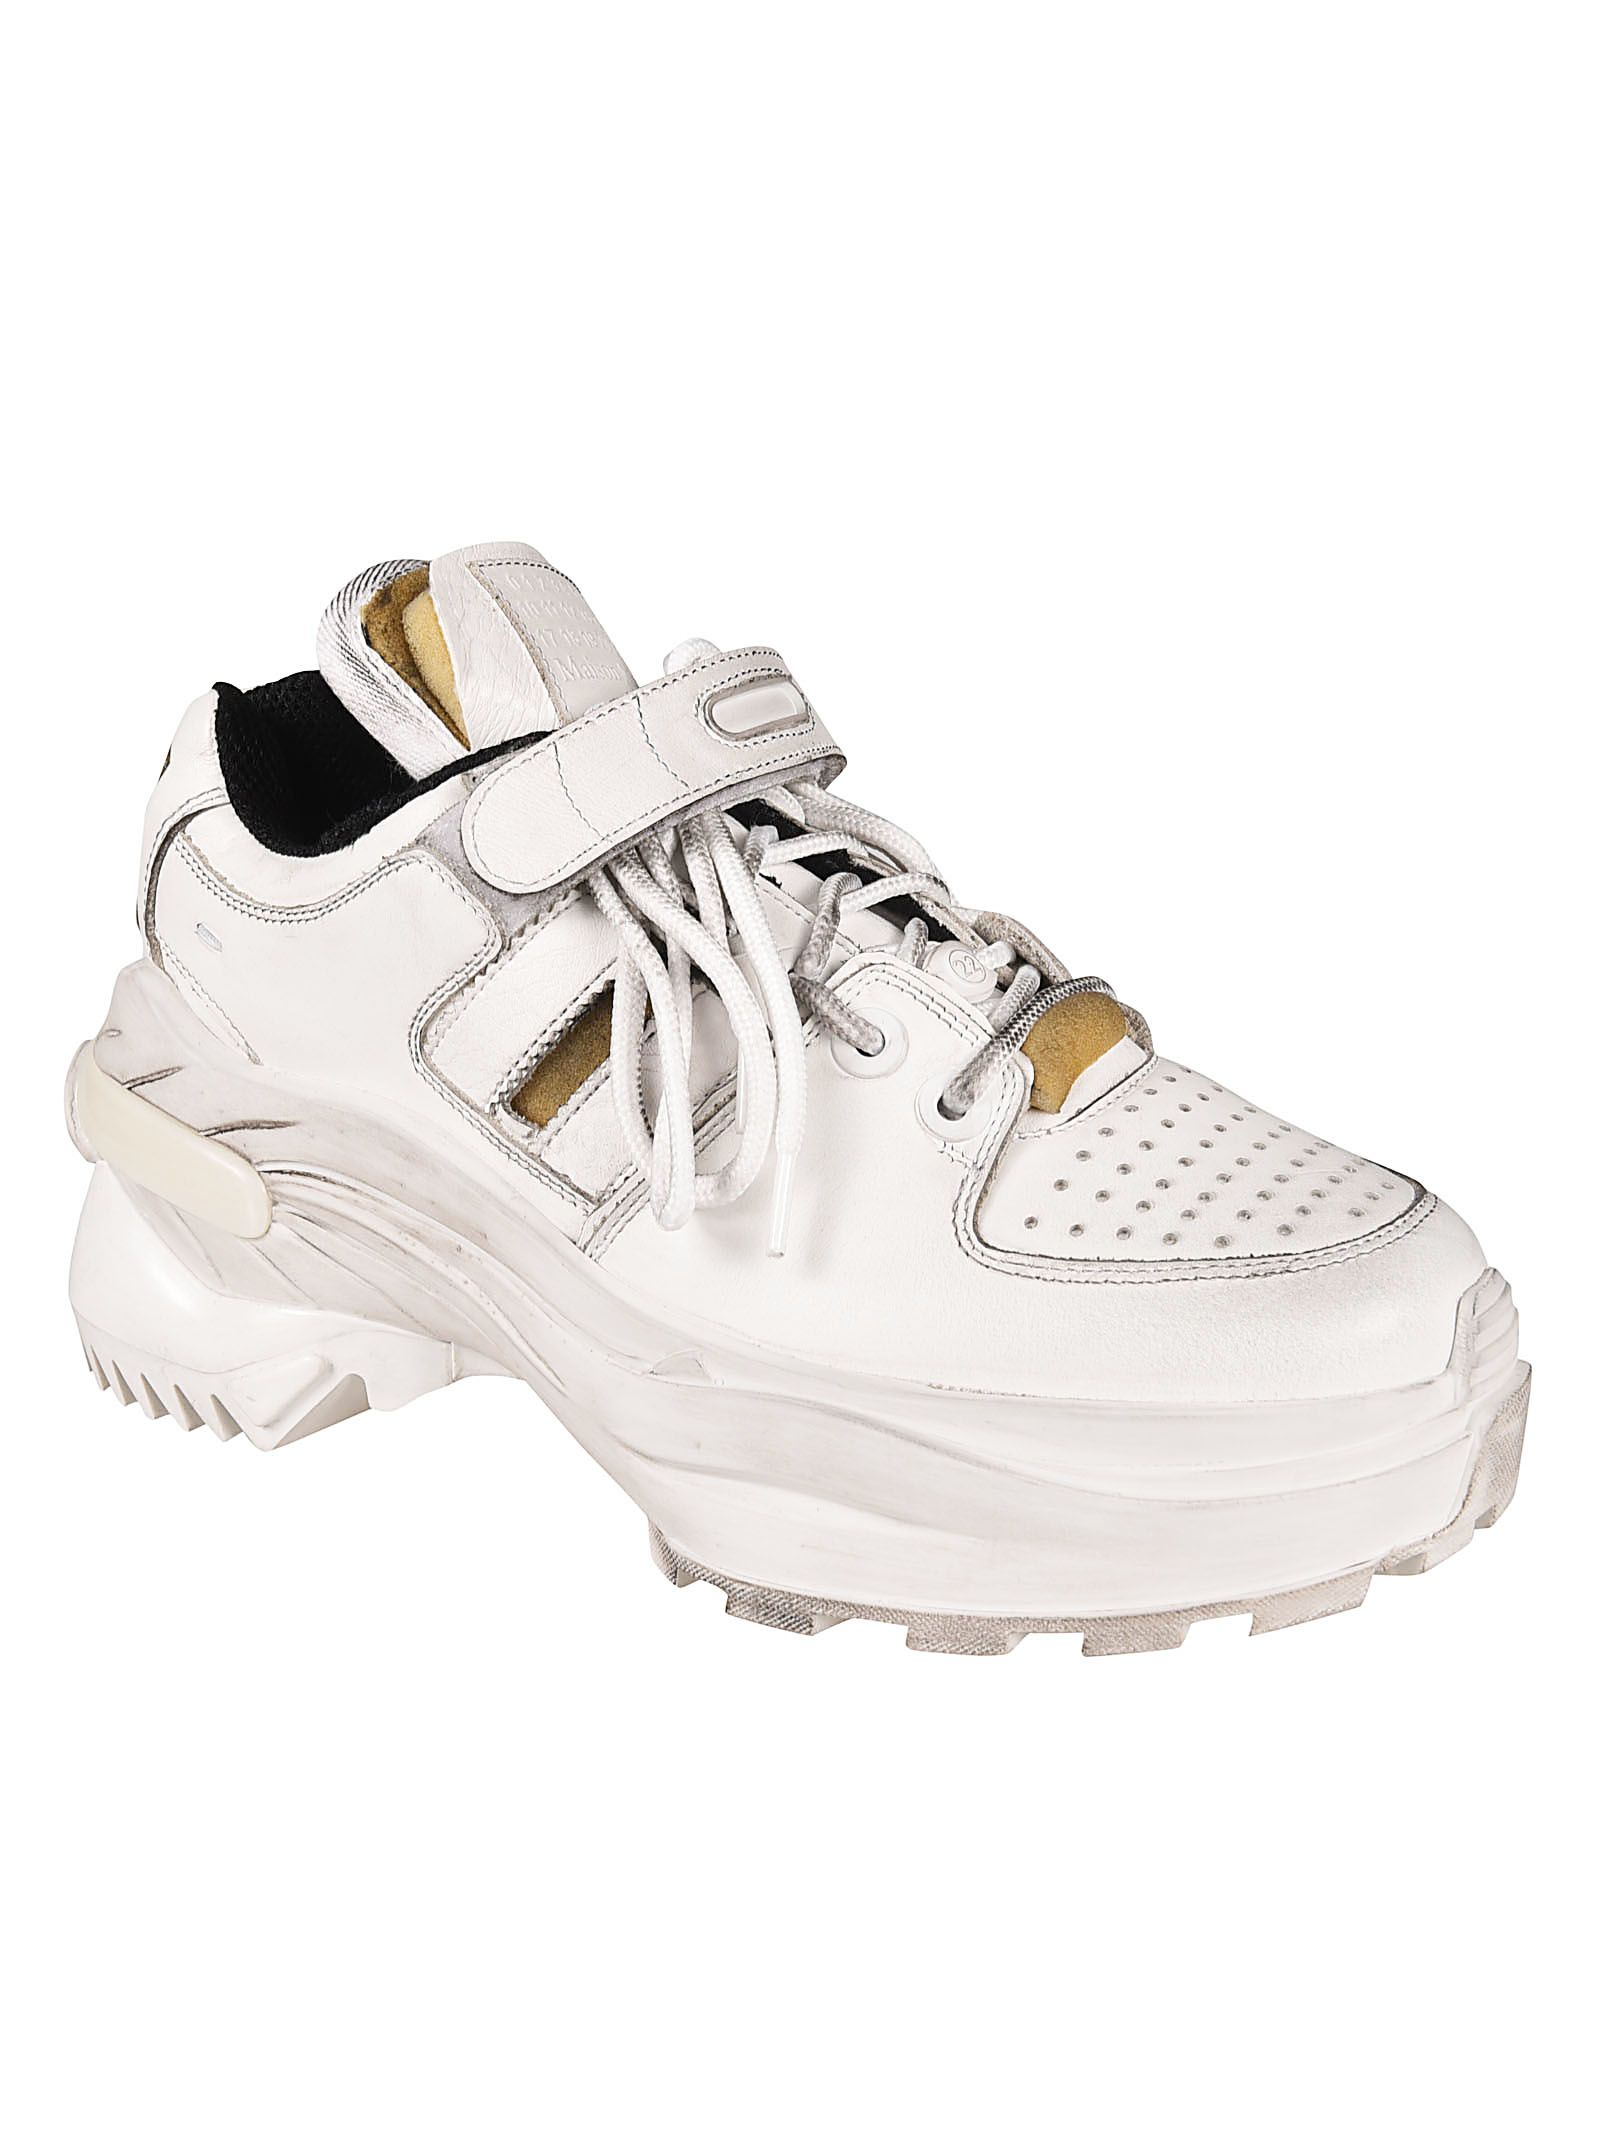 a4bcf7deb797e Maison Margiela Holographic Platform Sneakers - White Maison Margiela  Holographic Platform Sneakers - White ...